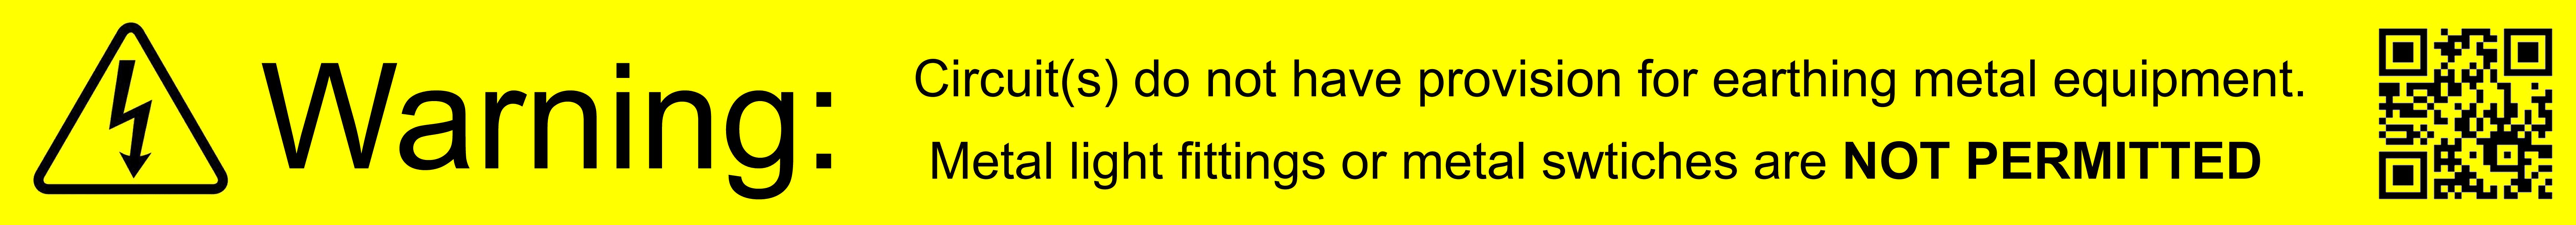 No cpc to lighting circuit warning notice.